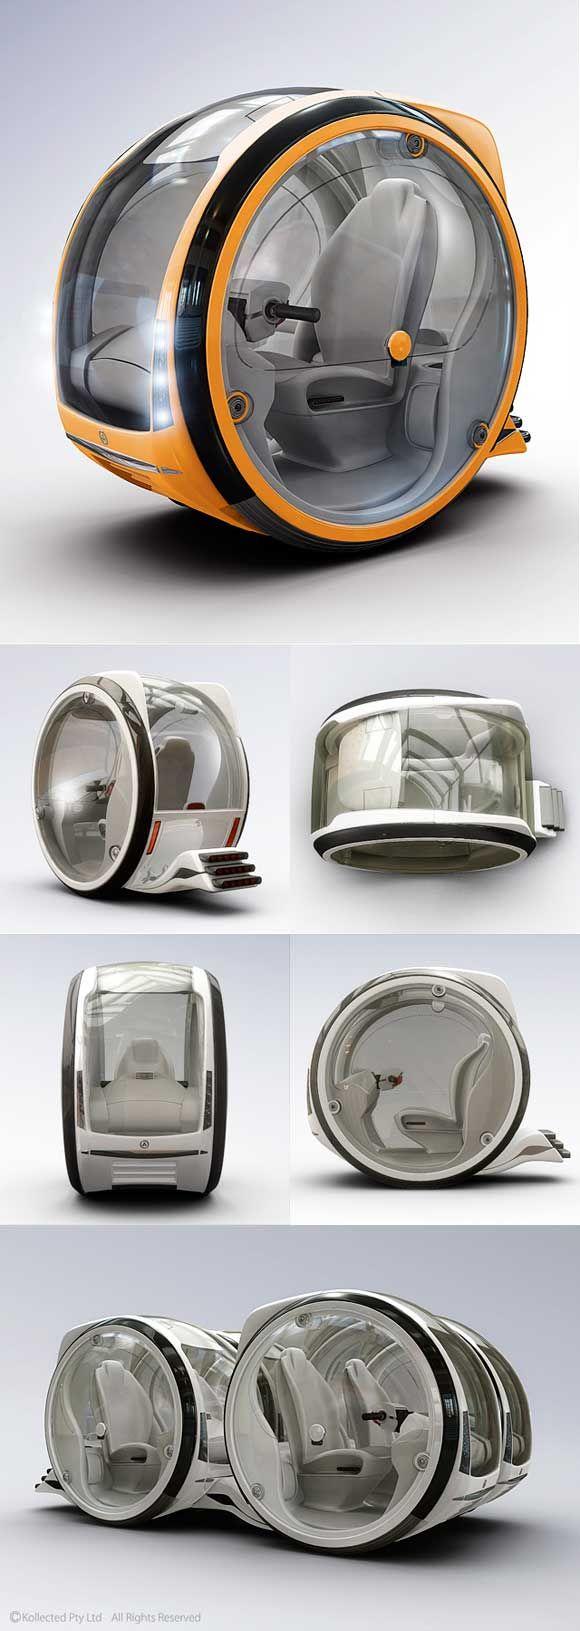 50 Awe-Inspiring Futuristic 3D Renderings by Nick Kaloterakis | MyCreativeDaddy